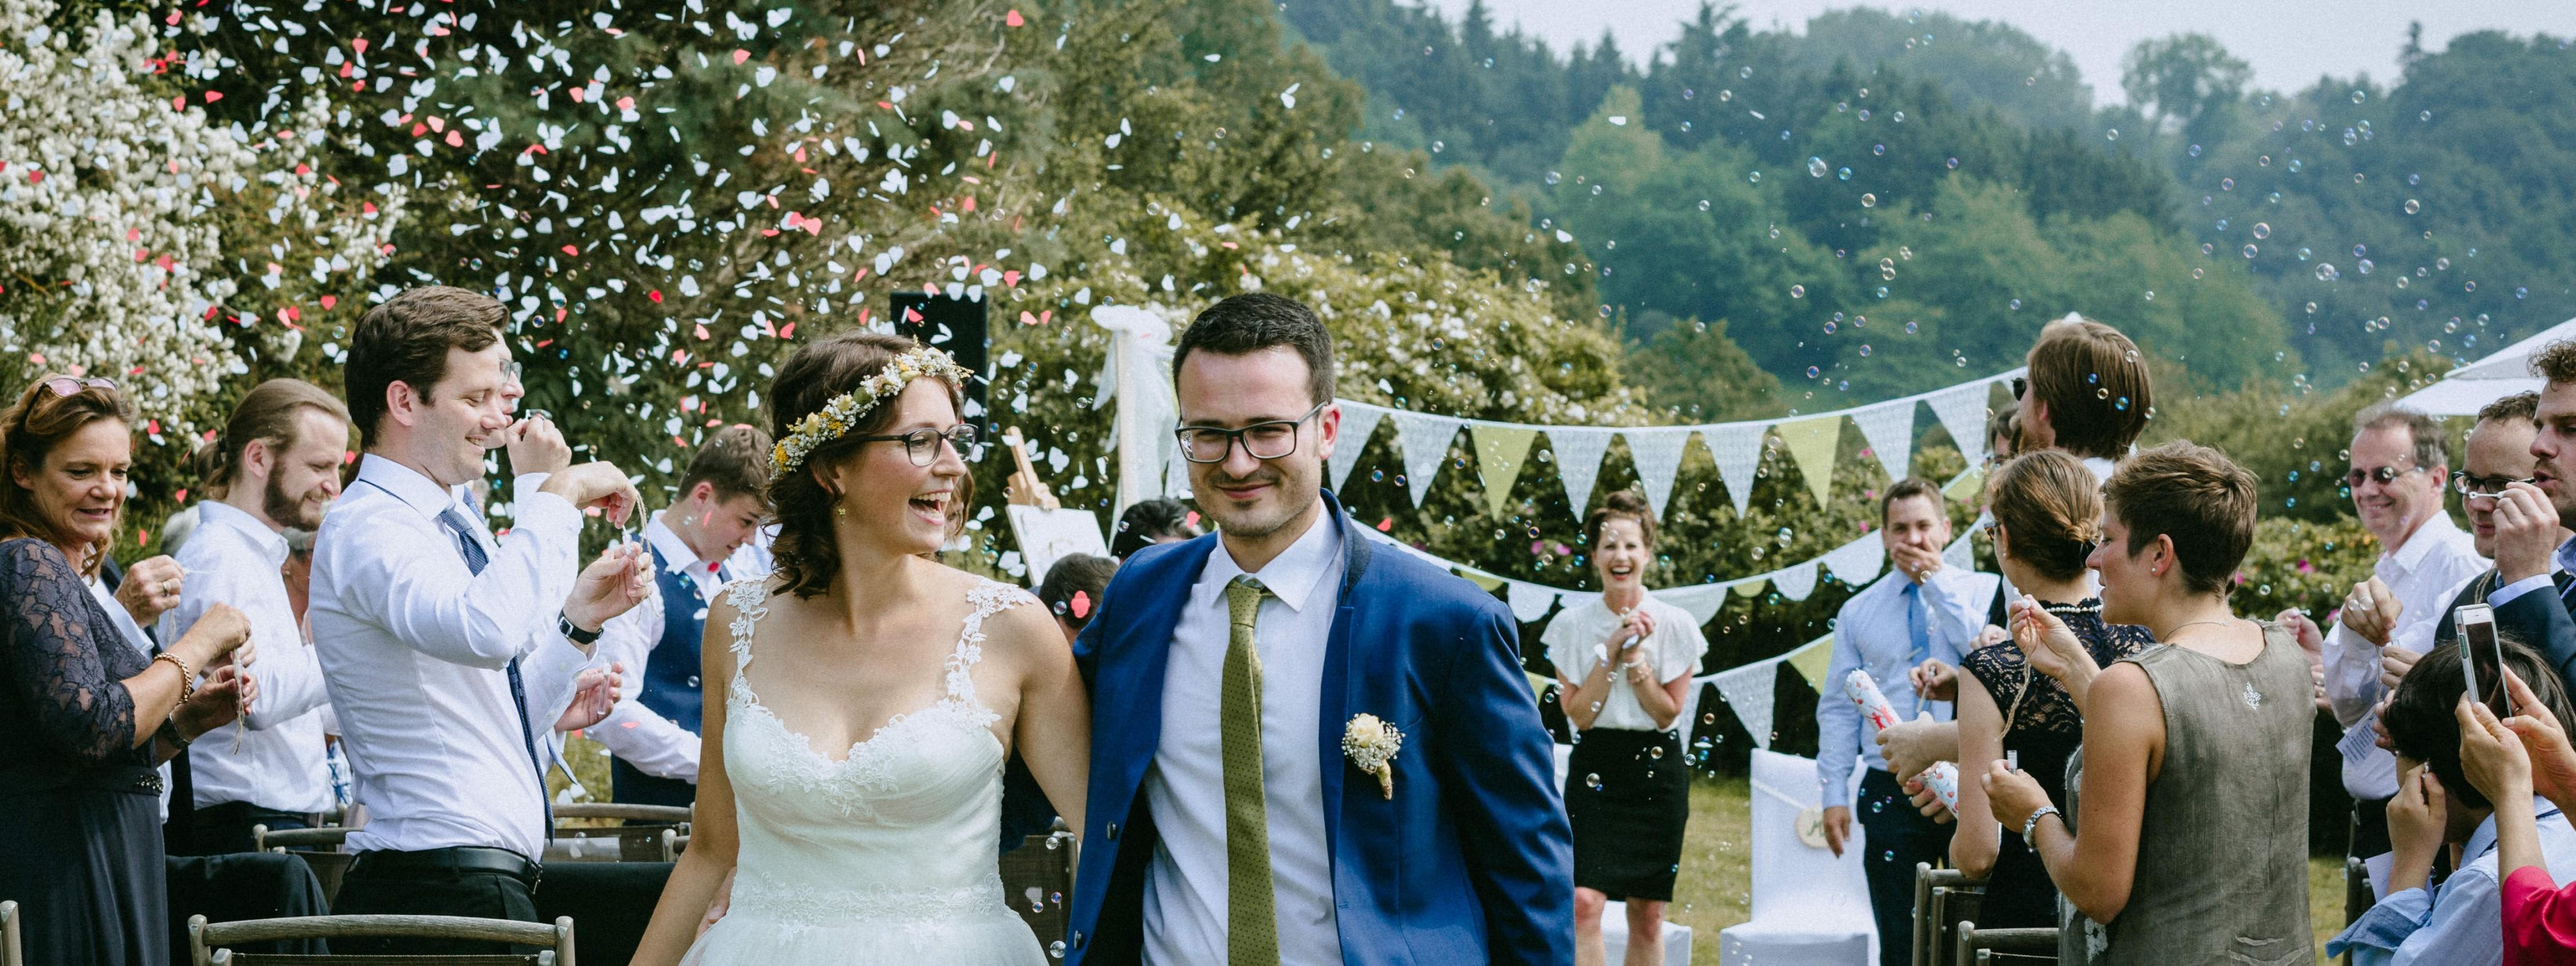 Hochzeitsfotograf Eifel Euskirchen Rheinland Pfalz